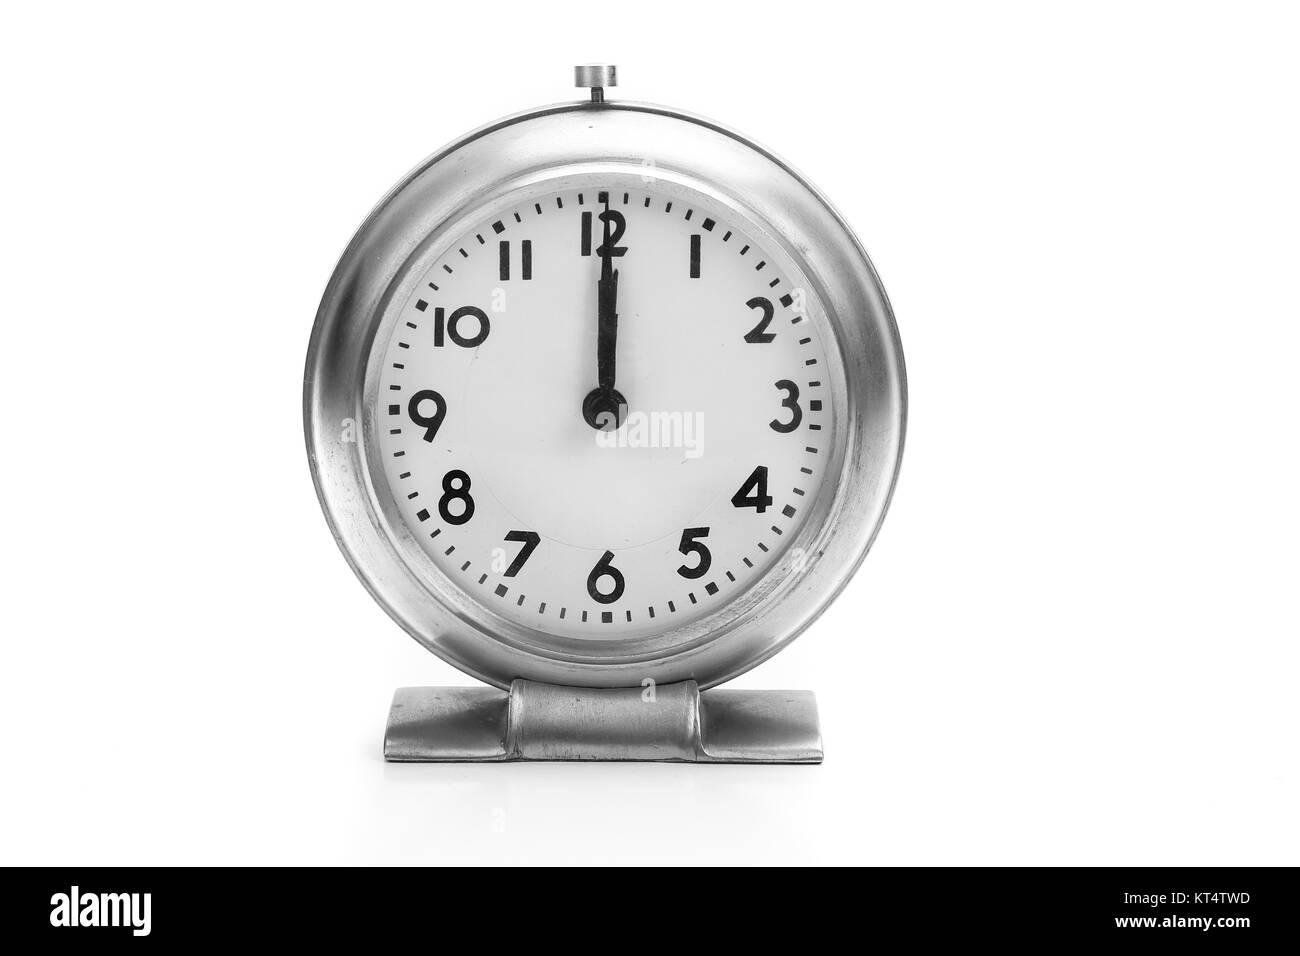 Vintage Analog Clock With Hands Set At 1200 Antique Alarm Clock